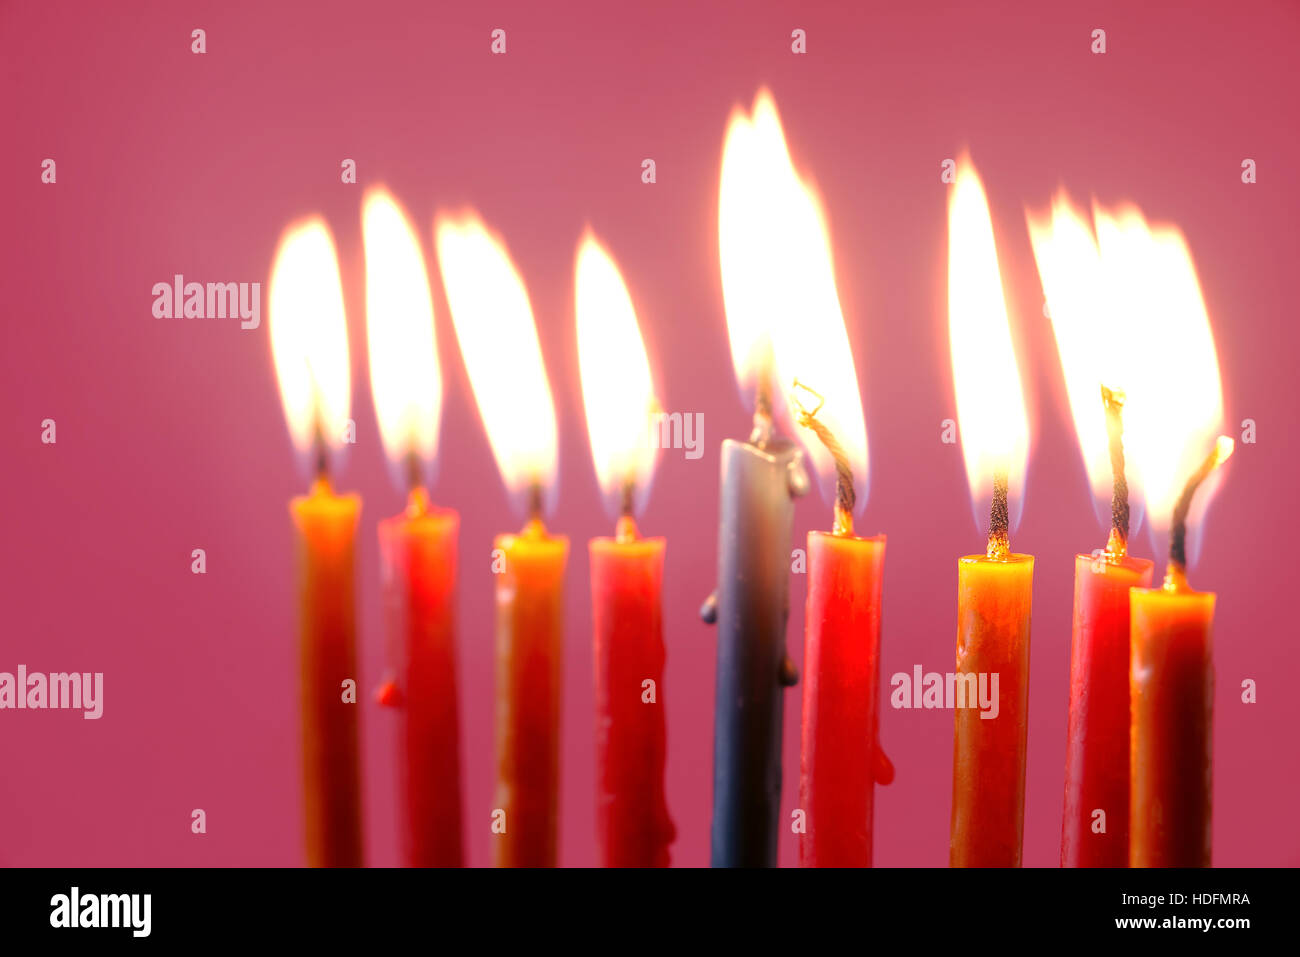 Hanukkah  burning candles on the pink background - Stock Image